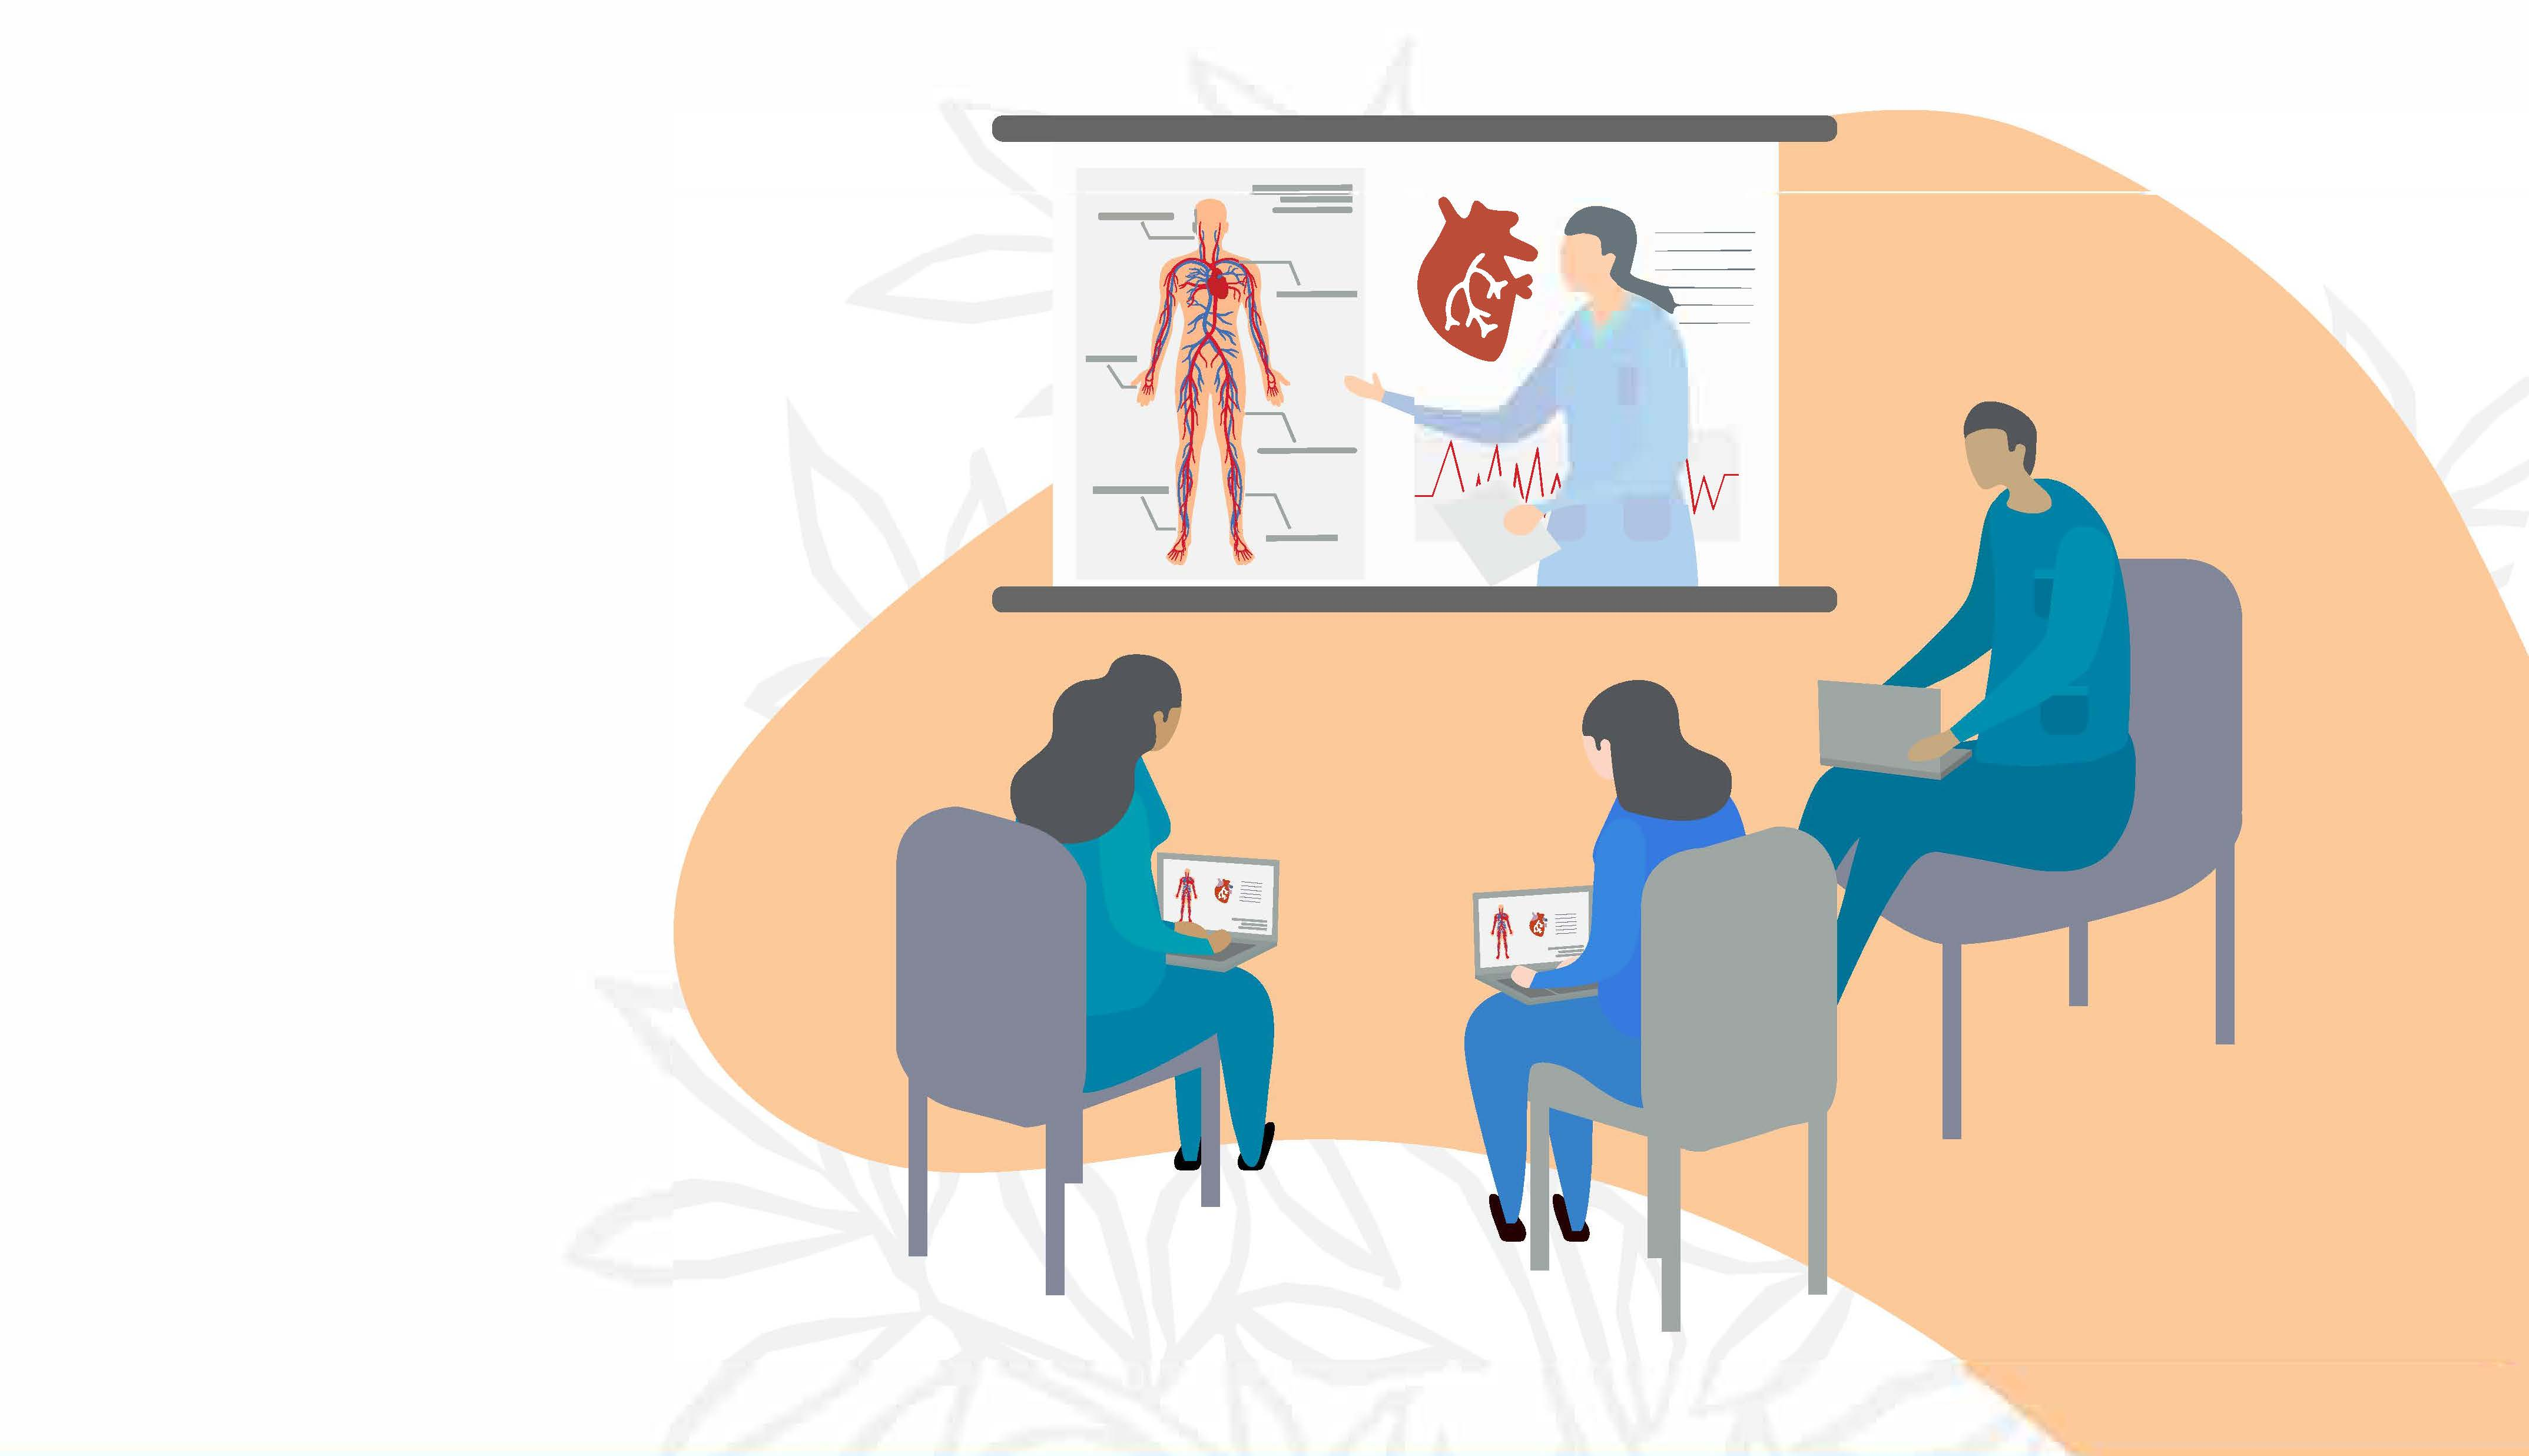 Elevating nursing knowledge and skills through online education